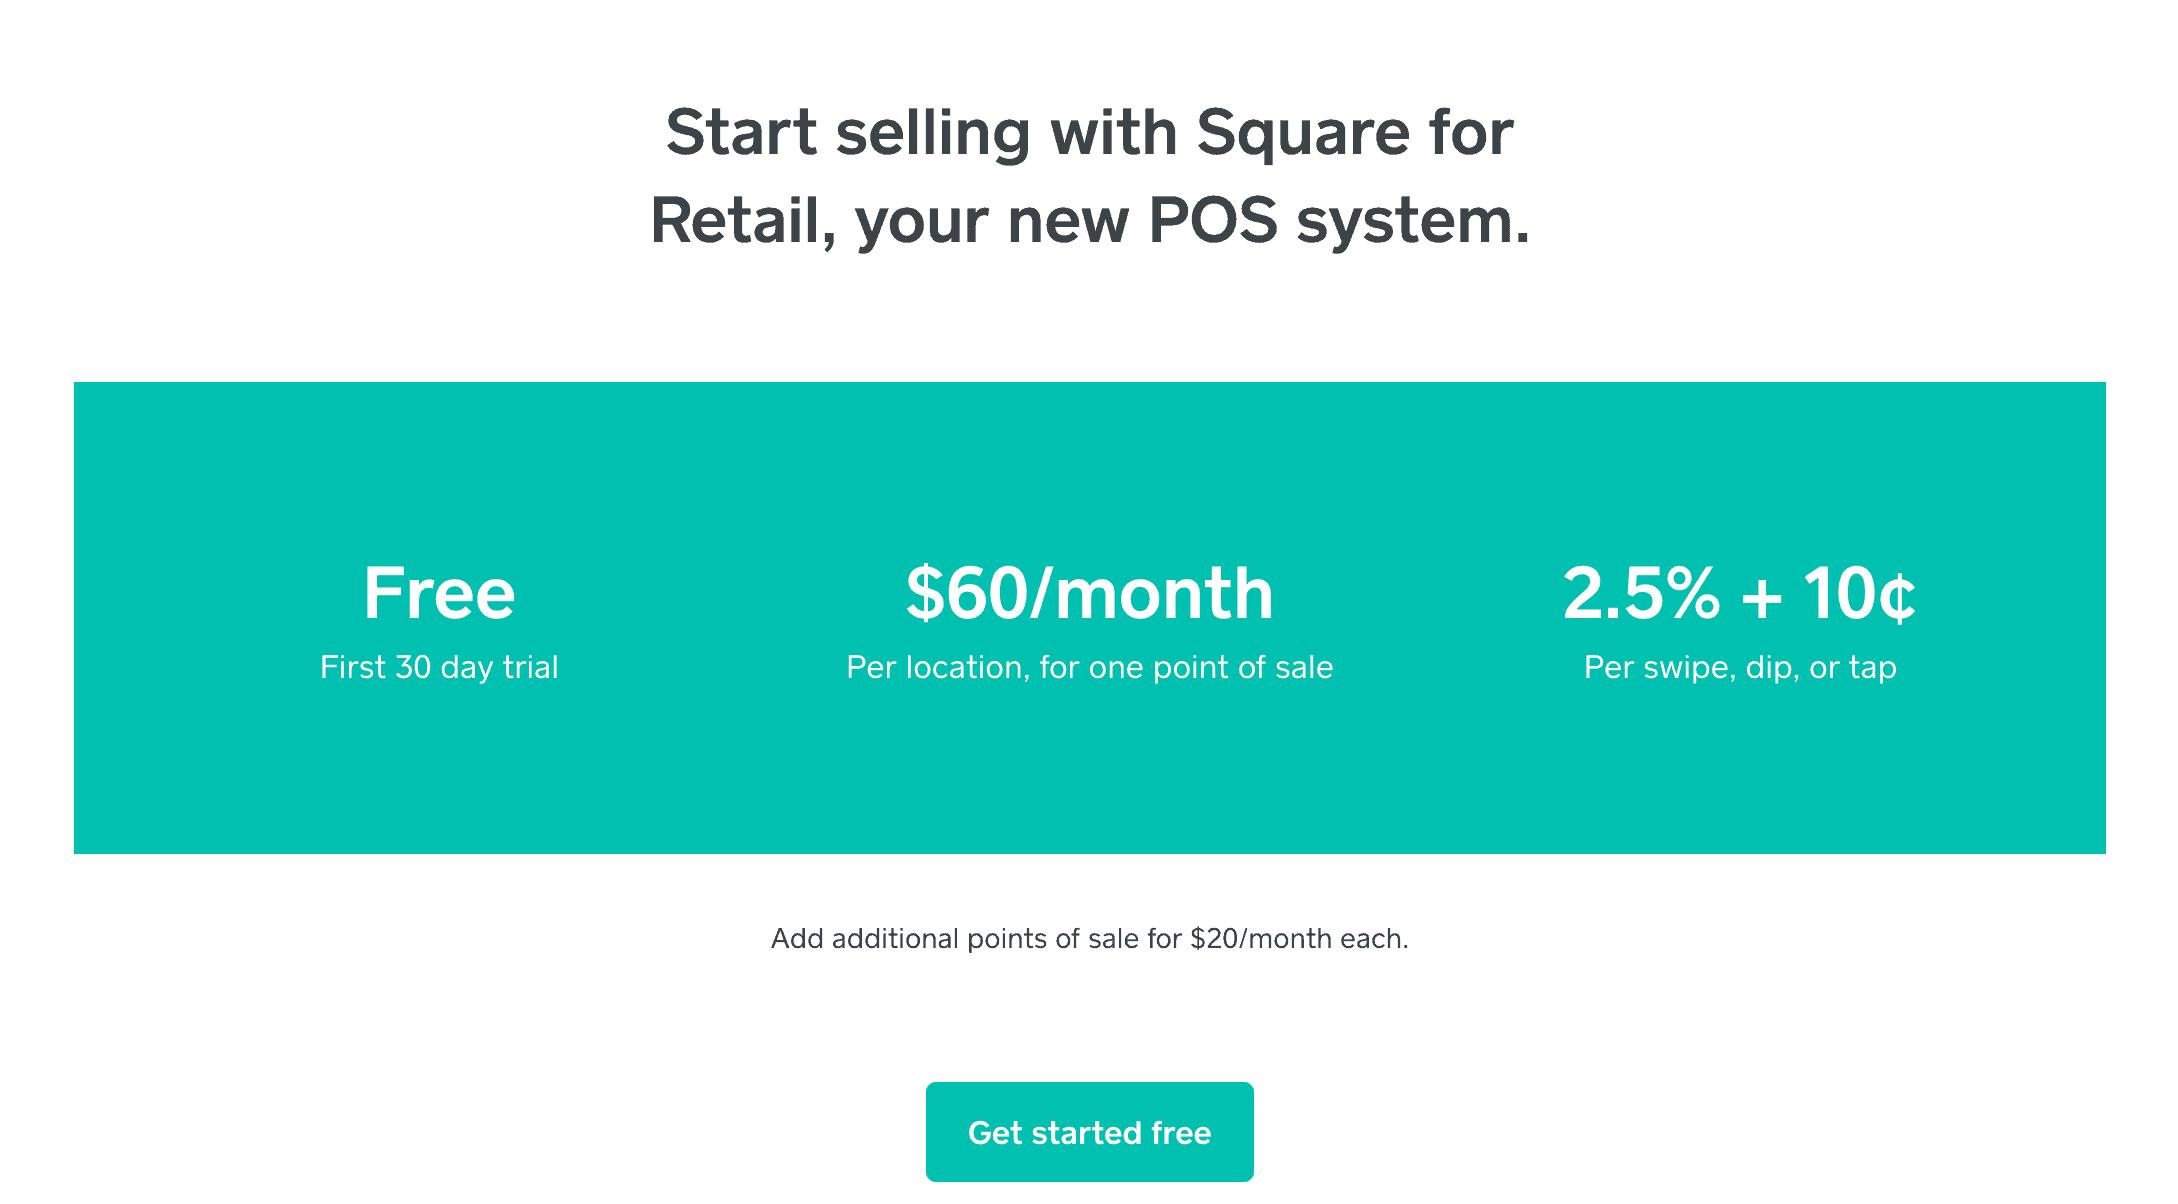 Square VS Shopventory